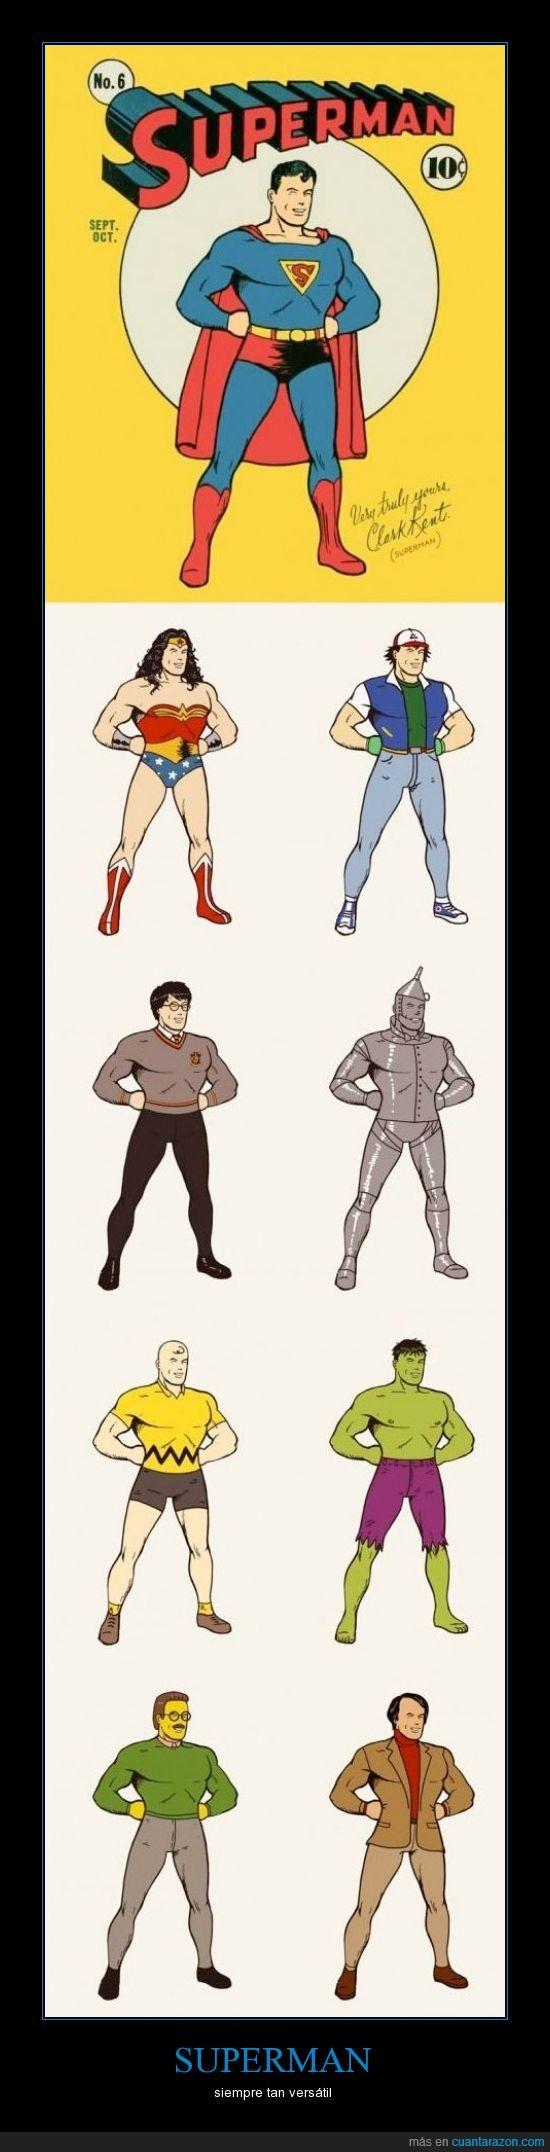 ash ketchum,charlie brown,DC COMICS,harry potter,heroe,hulk,ned flanders,superman,tinman,wonderwoman